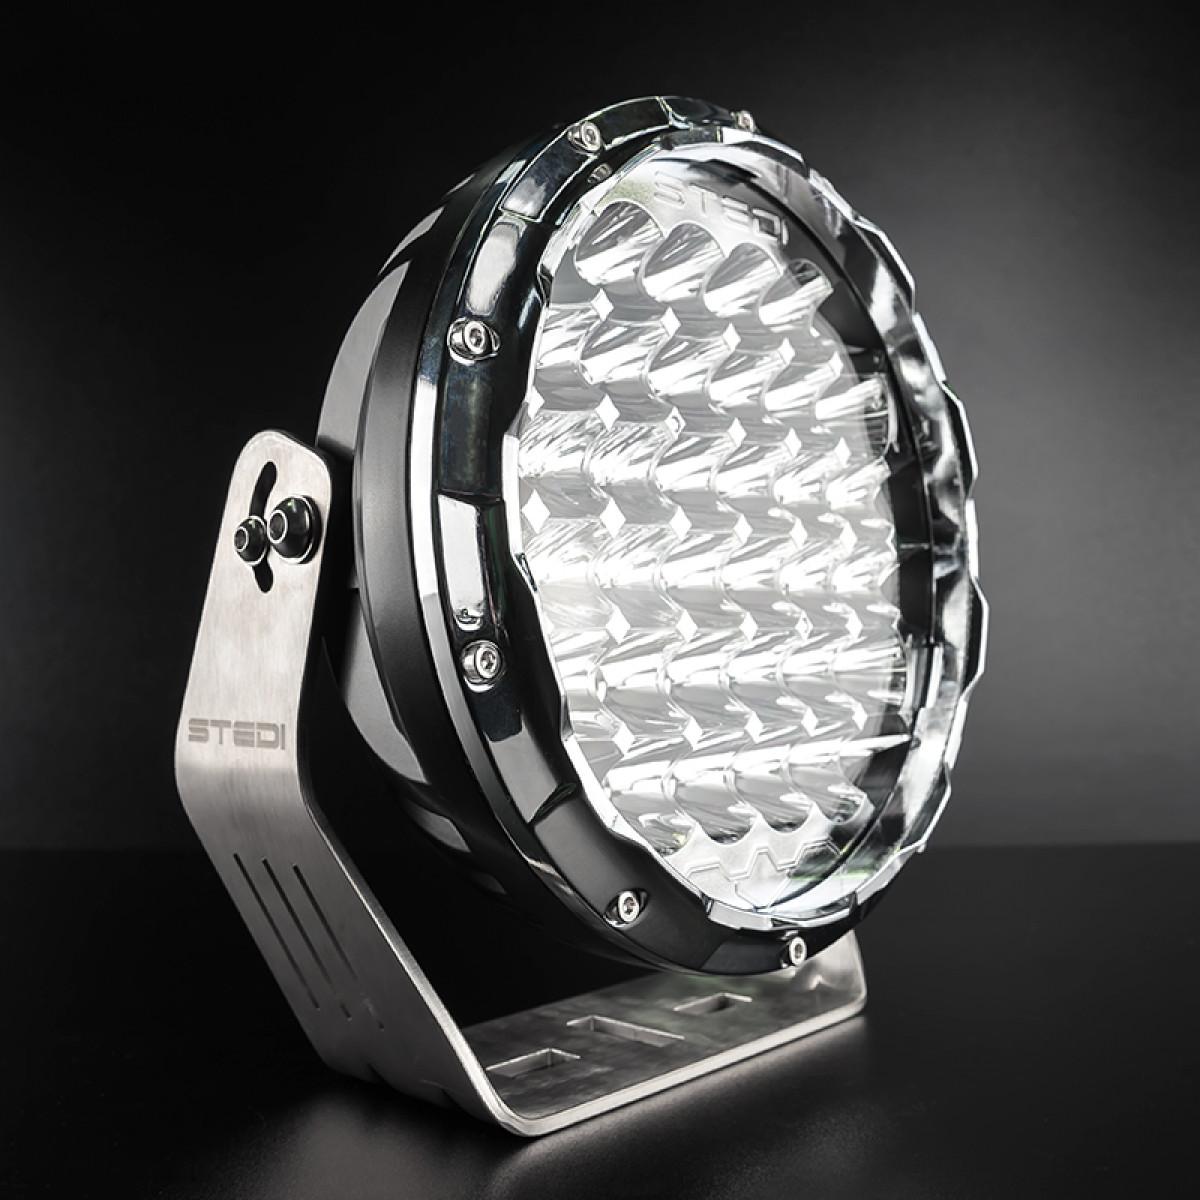 STEDI CHROME TYPE-X 8.5″ LED DRIVING LIGHTS (PAIR)